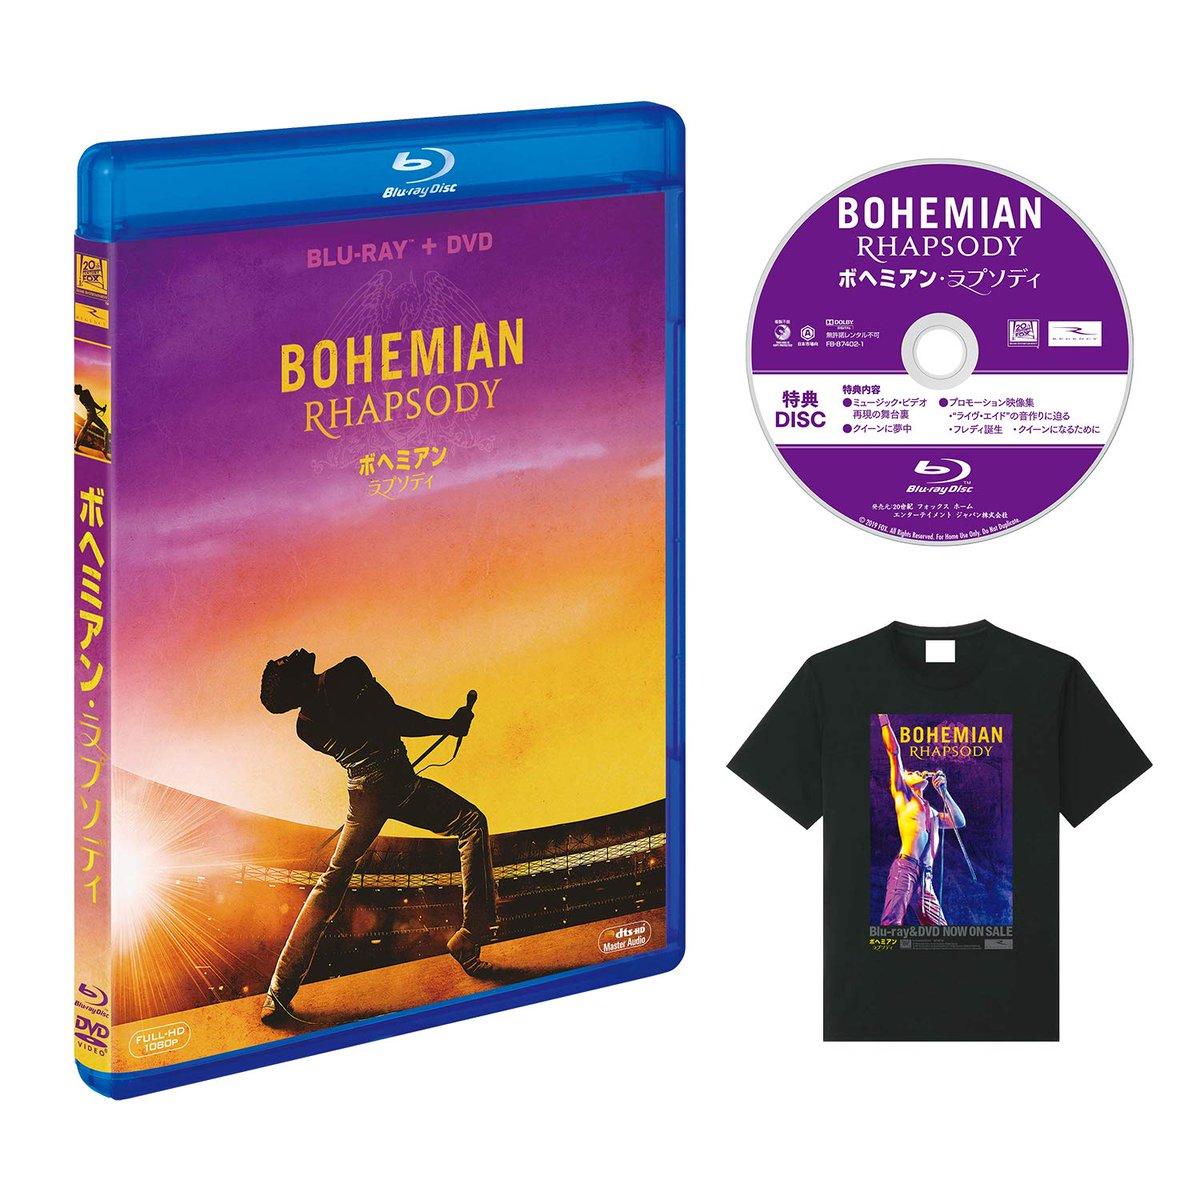 test ツイッターメディア - 今Amazonで【https://t.co/2dhJq8OQZT限定】ボヘミアン・ラプソディ 2枚組ブルーレイ&DVD (特典映像ディスク&オリジナルTシャツ付き)[Blu-ray]がベストセラー! - https://t.co/Dr3C6Lar71 https://t.co/2cR93u5AJc